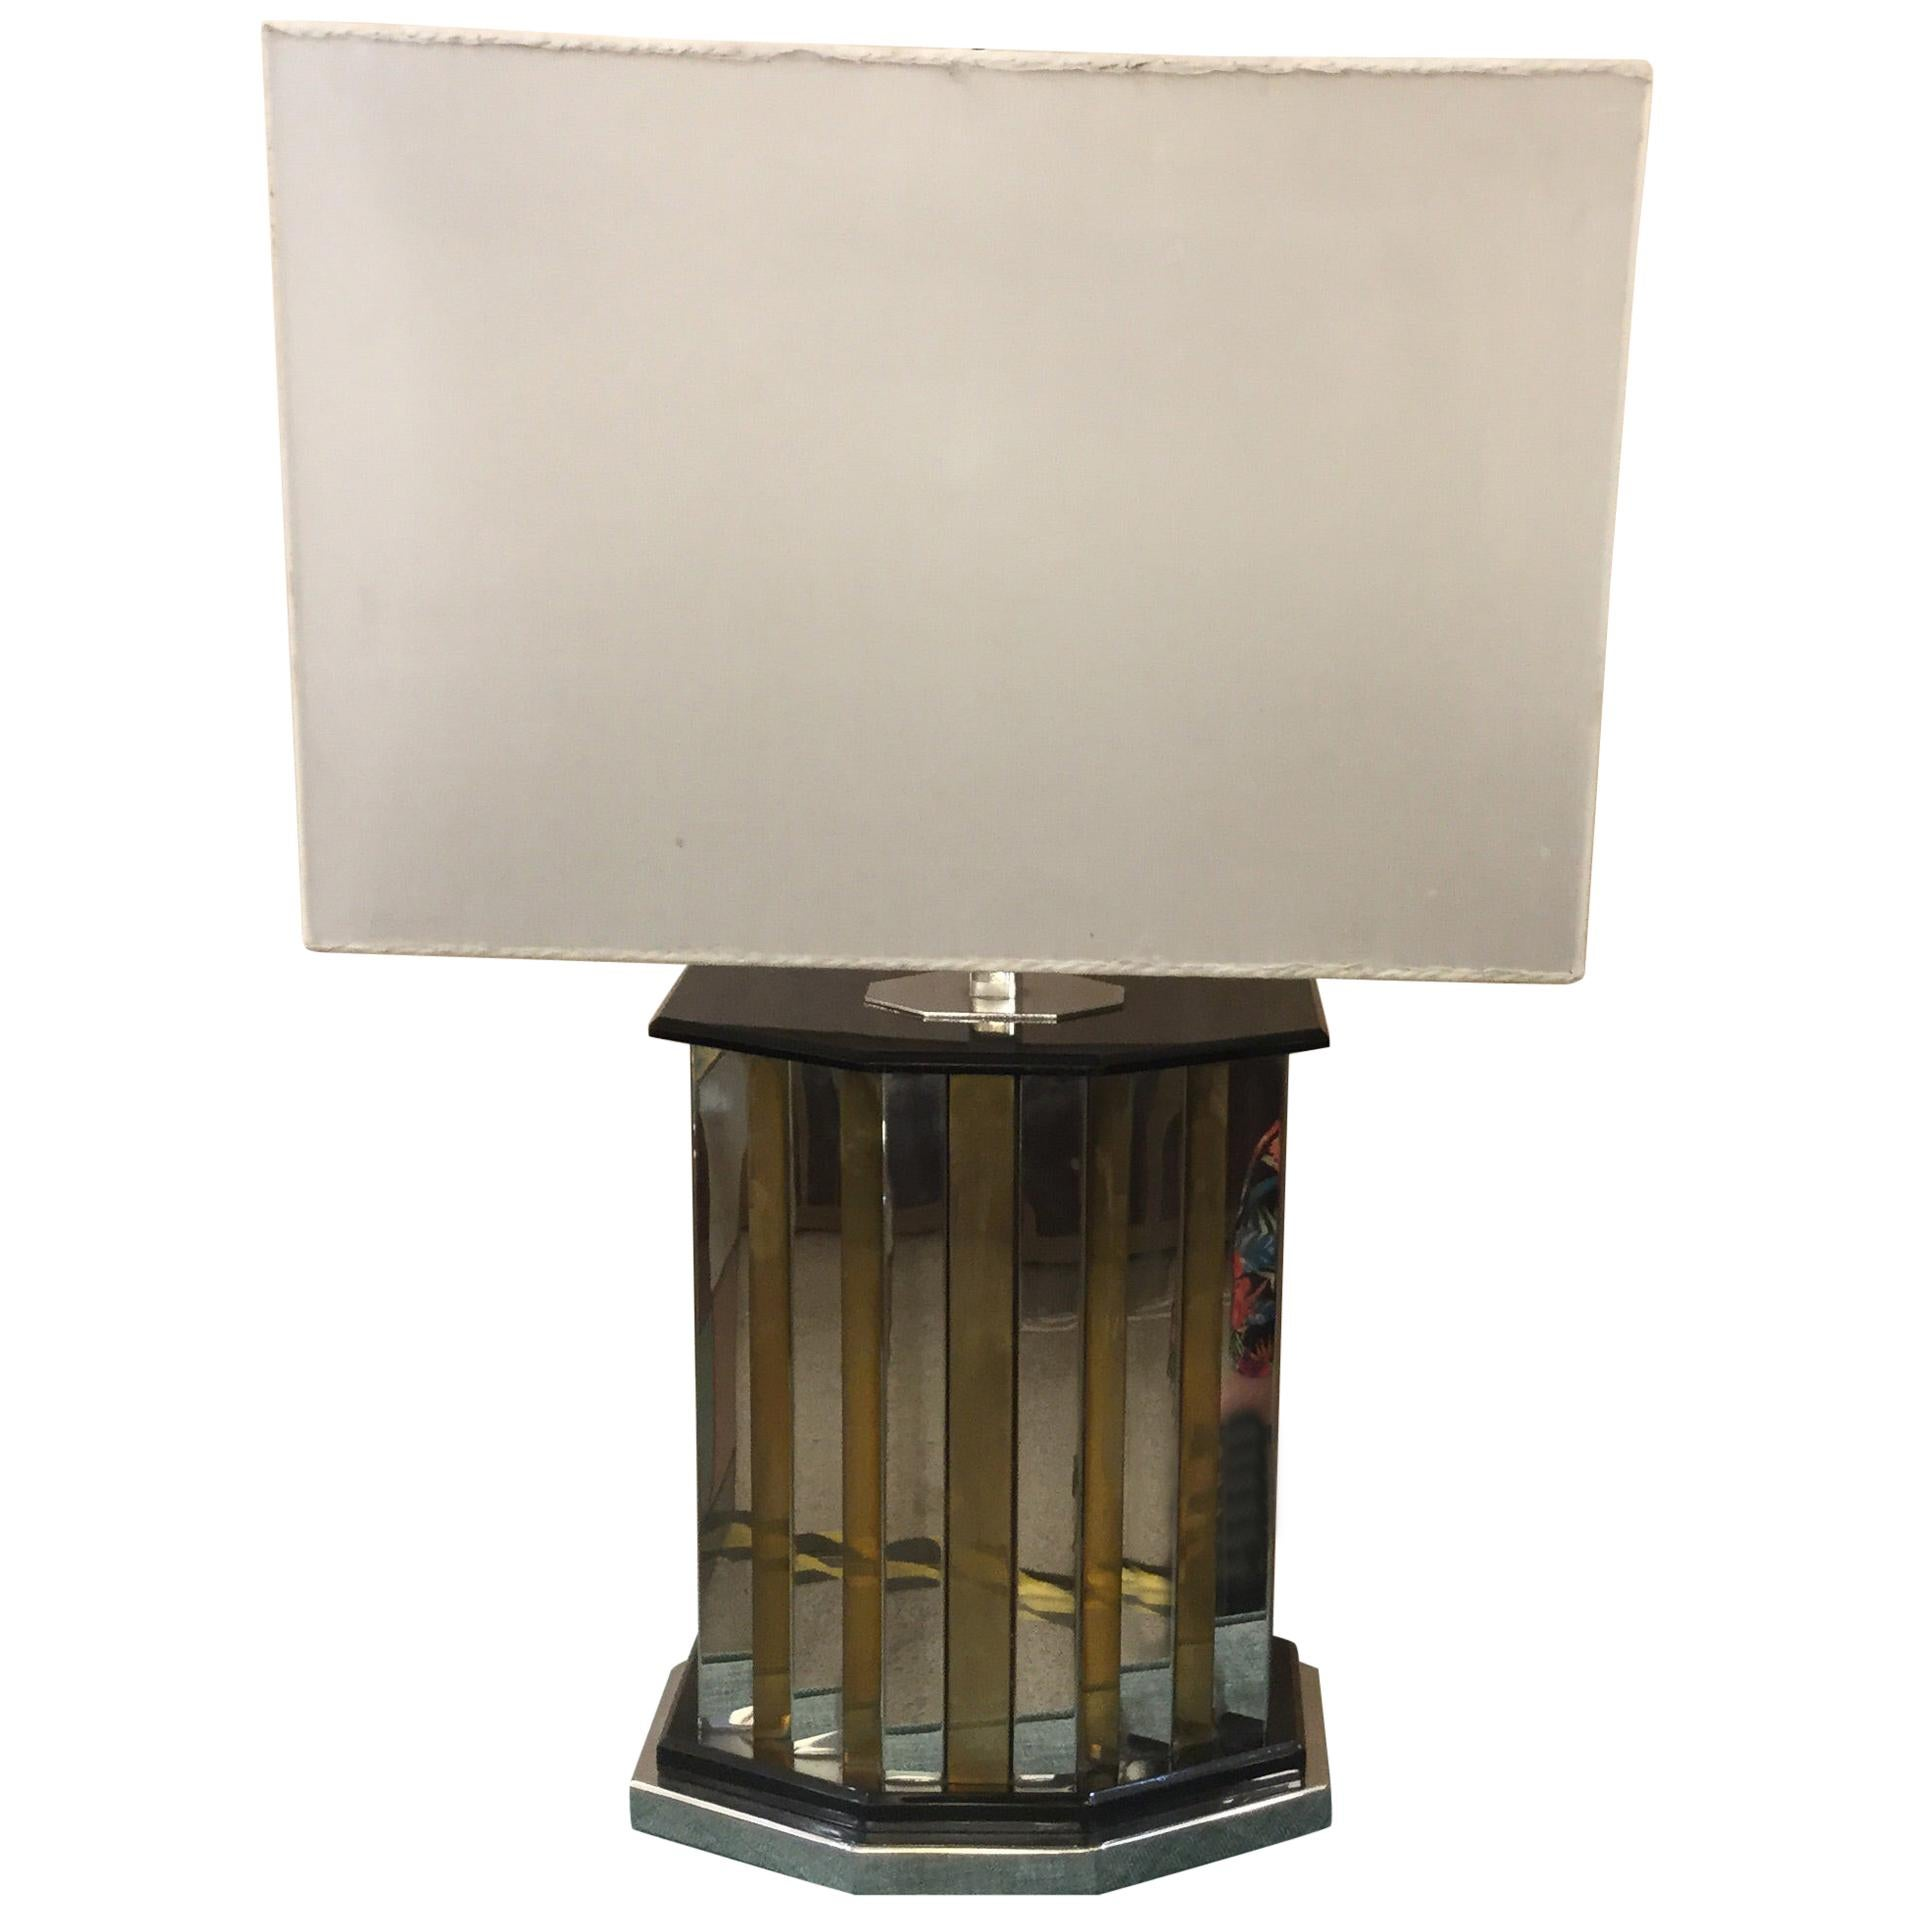 Italian Chrome and Brass Lamp by Romeo Rega, 1970s